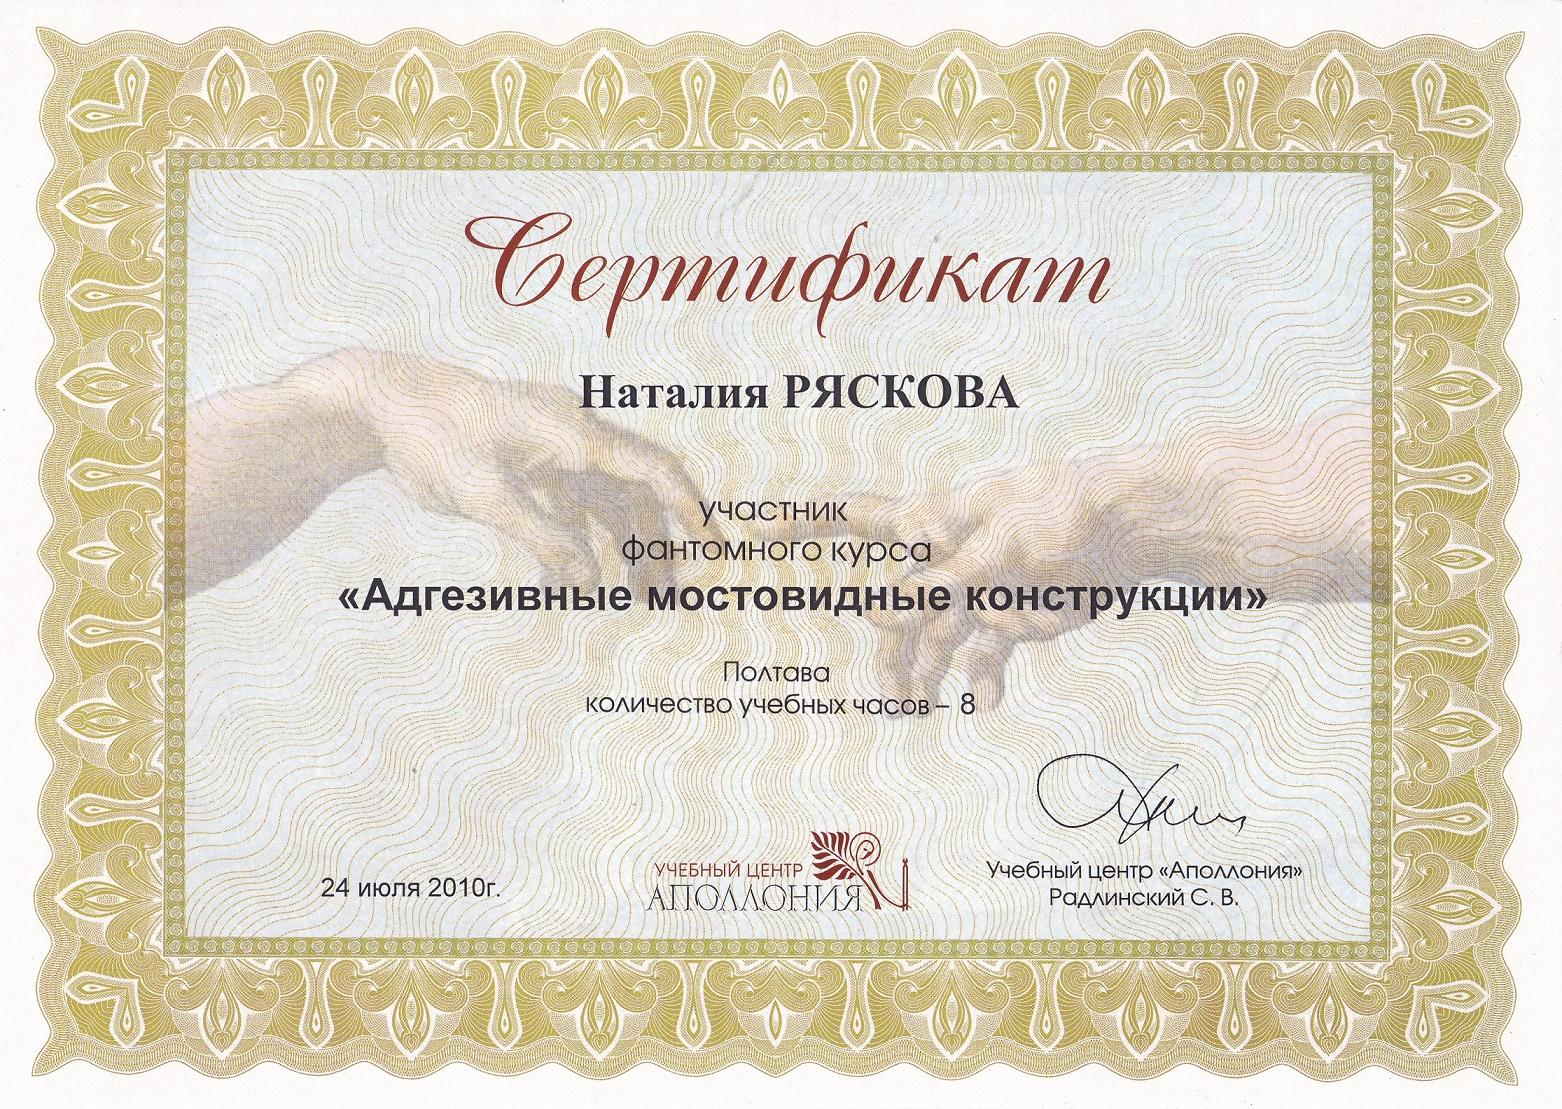 https://oris-vidnoe.ru/wp-content/uploads/2021/05/ryaskova1.jpg